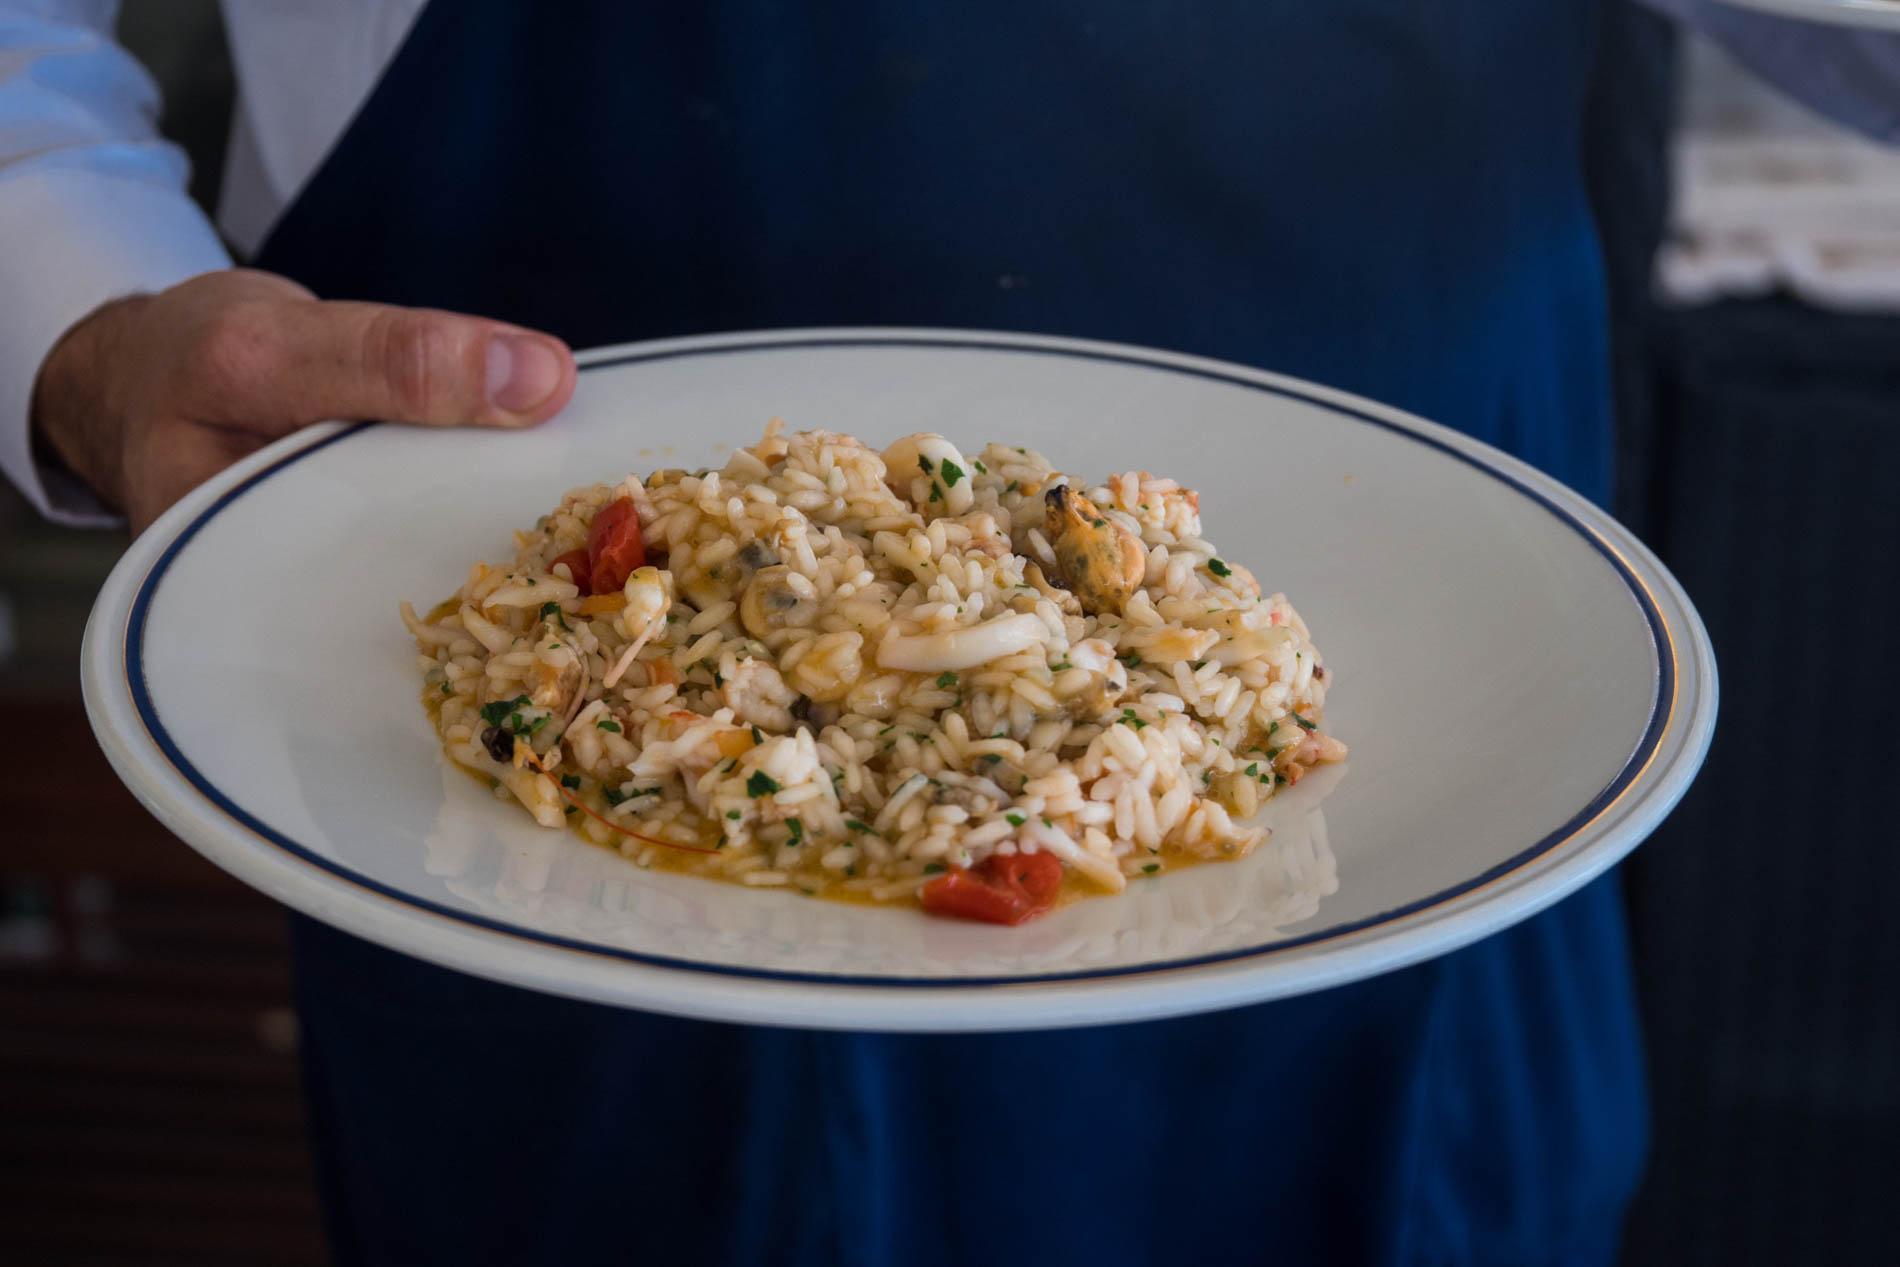 la-piedigrotta-ristorante-da-carmine-e-antonio-198